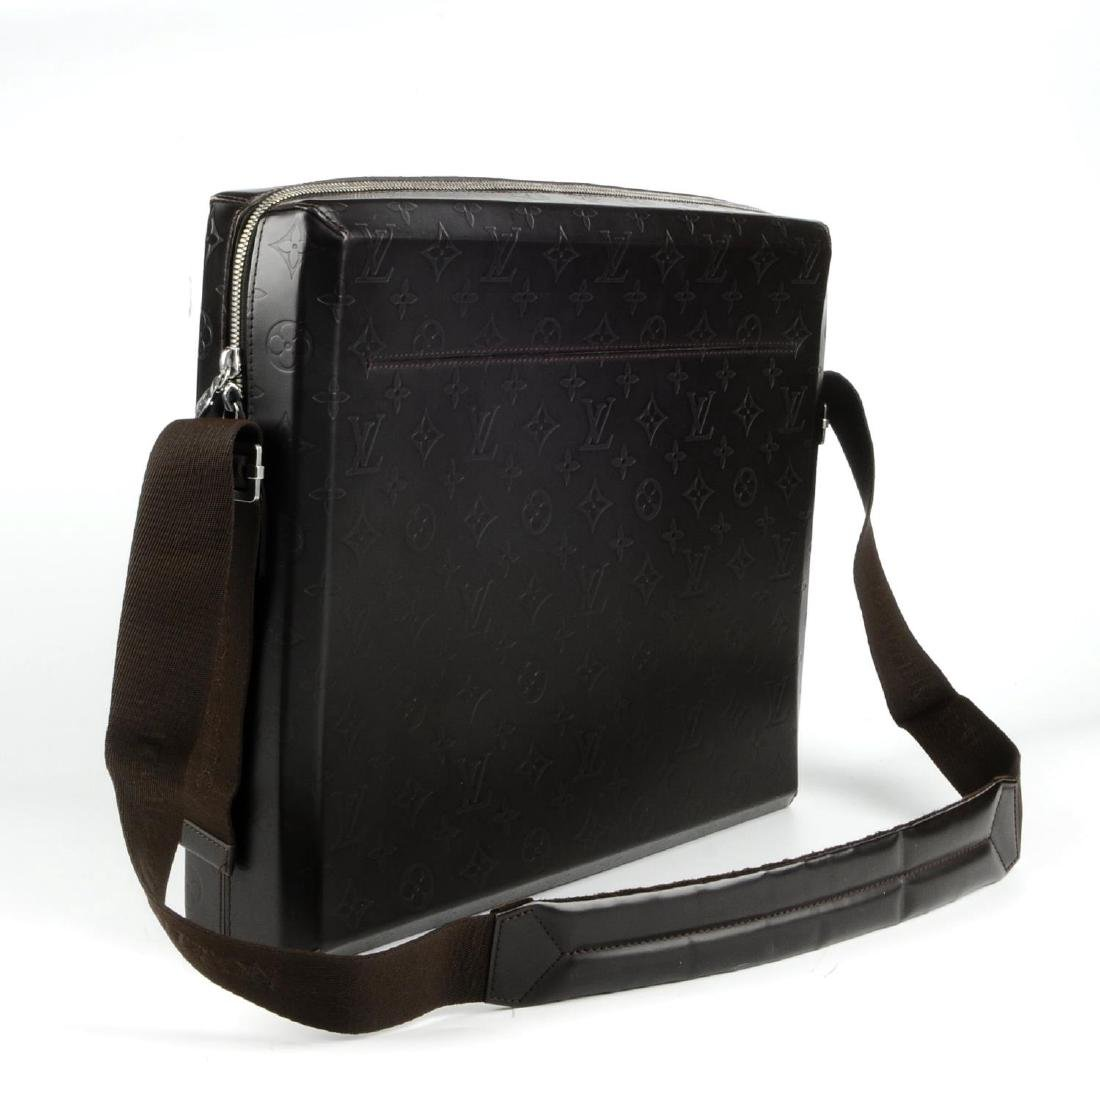 LOUIS VUITTON - a Monogram Steve Cafe messenger bag. - 4